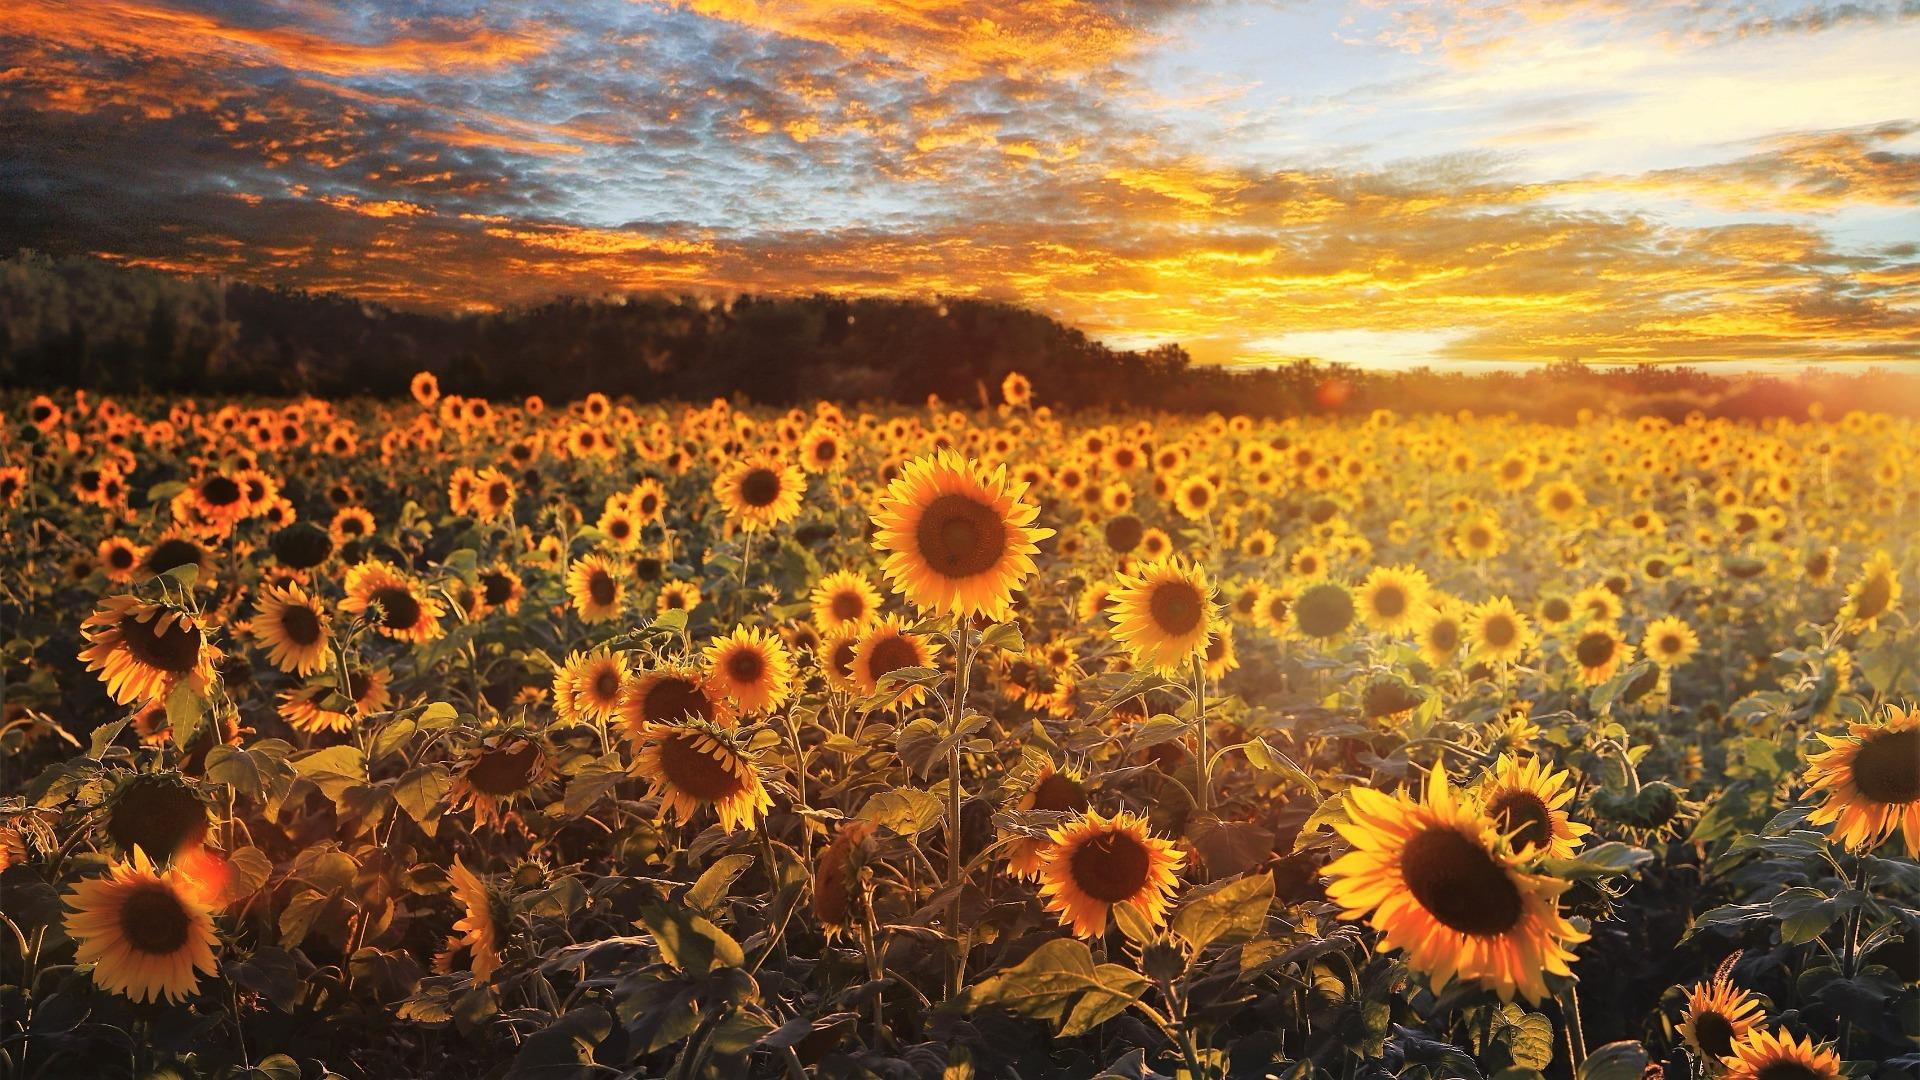 Sunflower wallpaper - backiee